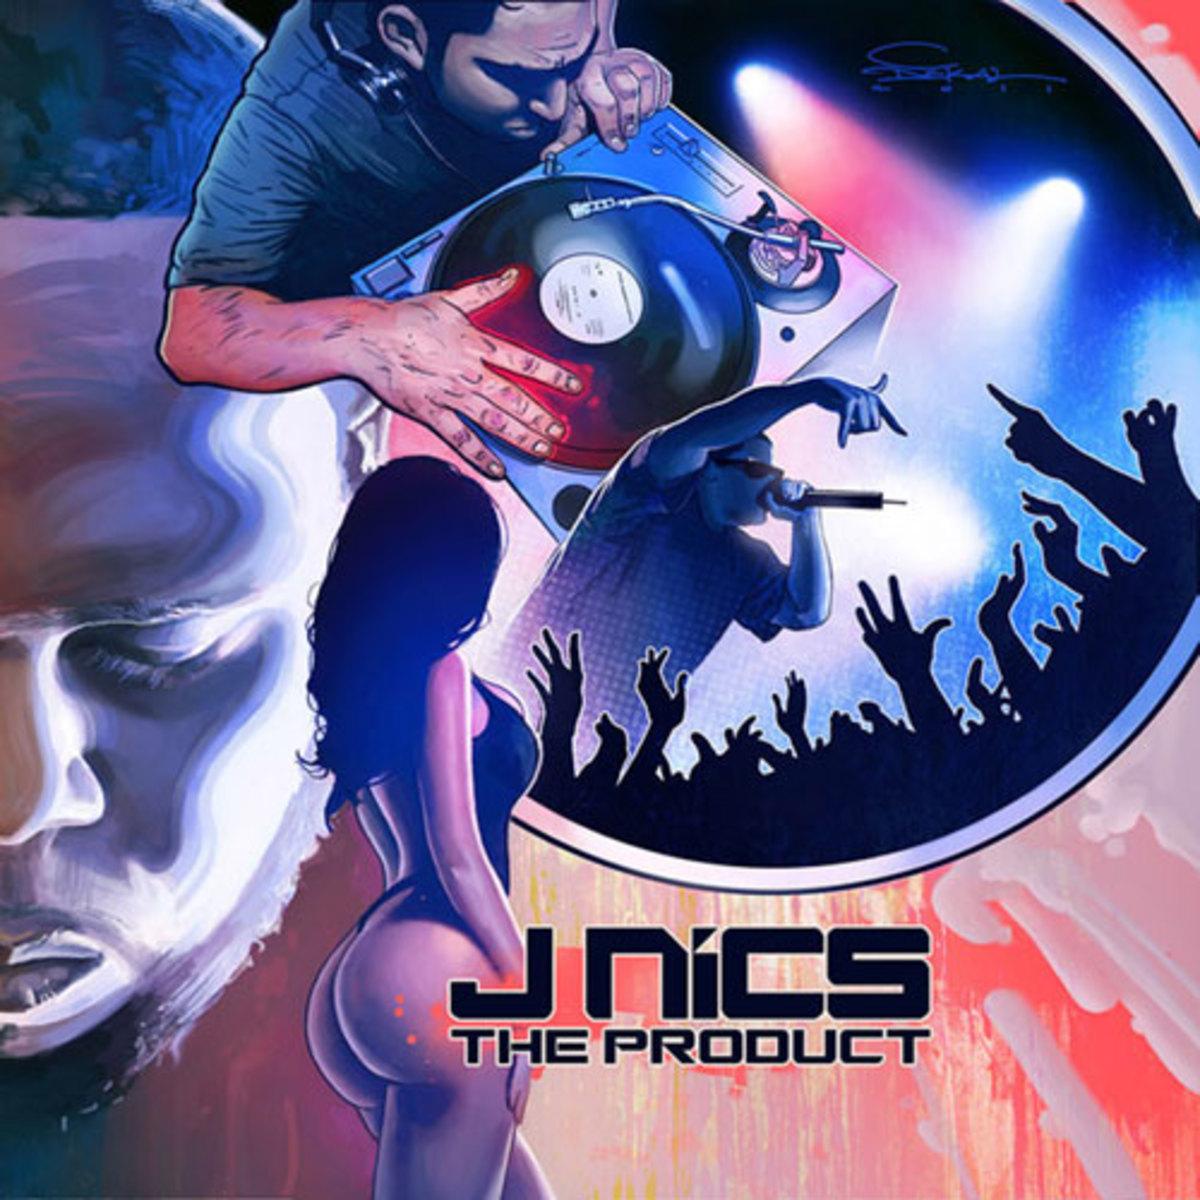 jnics-product.jpg